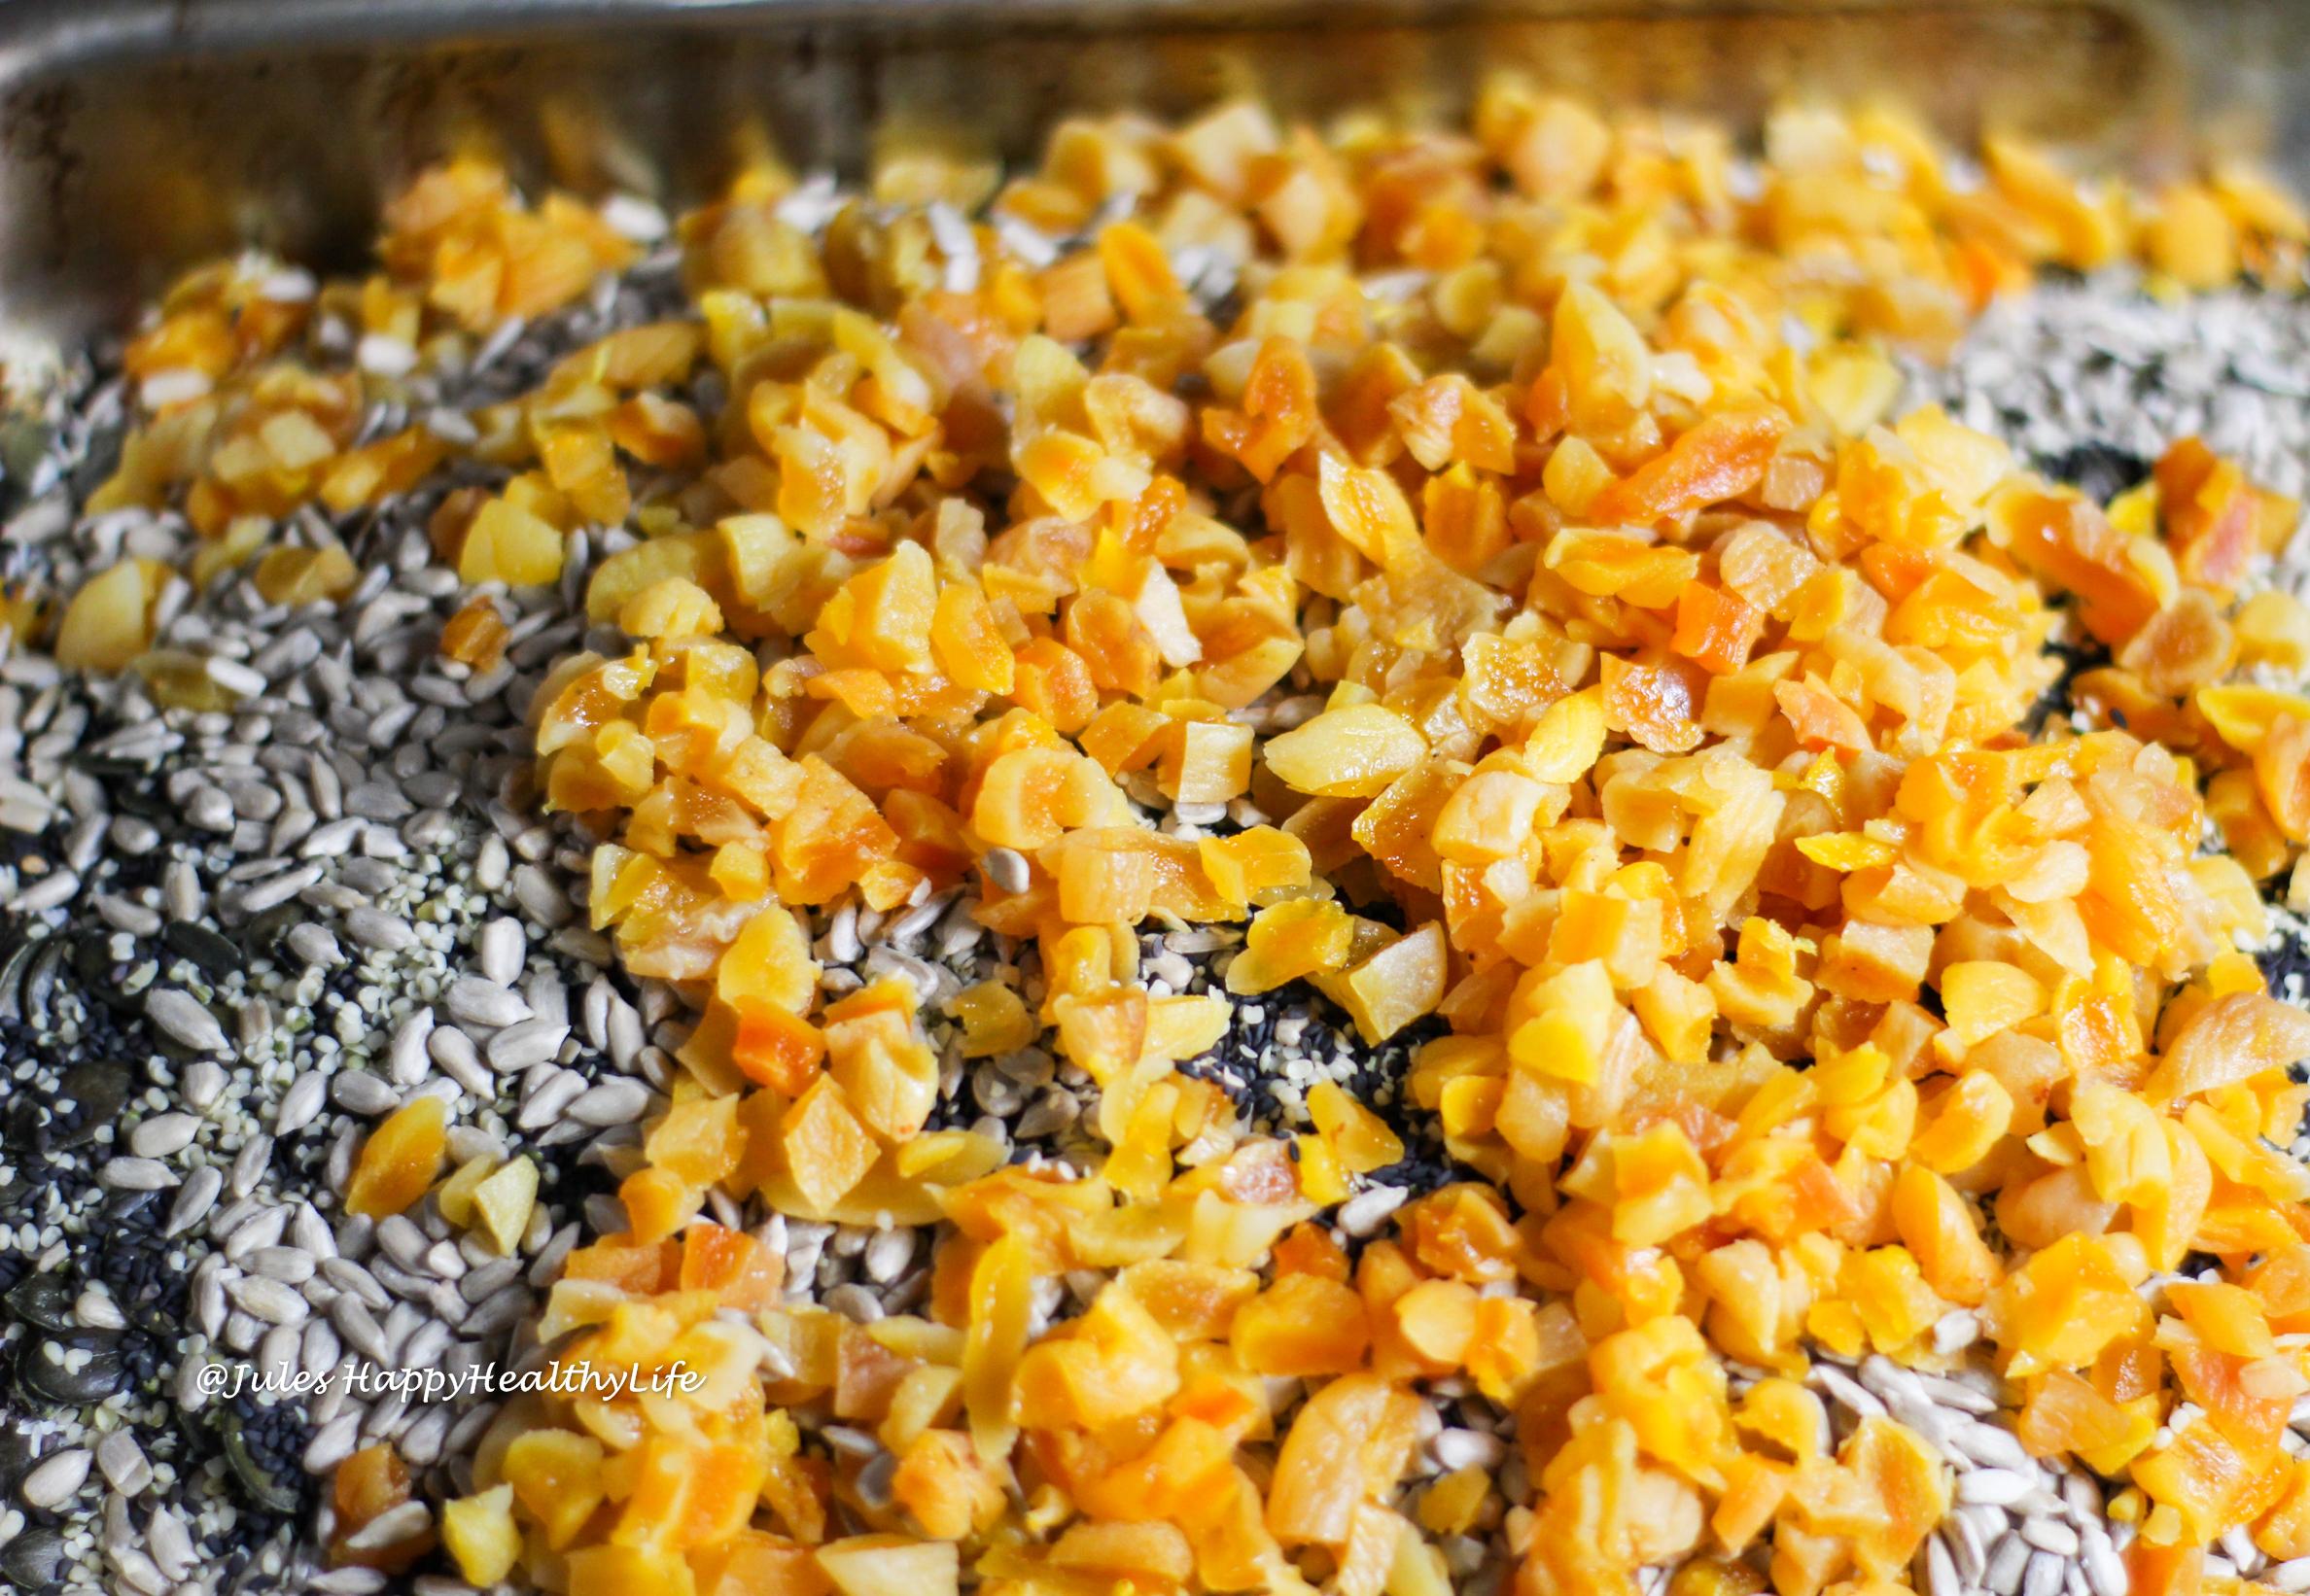 Aprikosen für das Health Angel Yoga Granola - Kurkuma Chai Granola